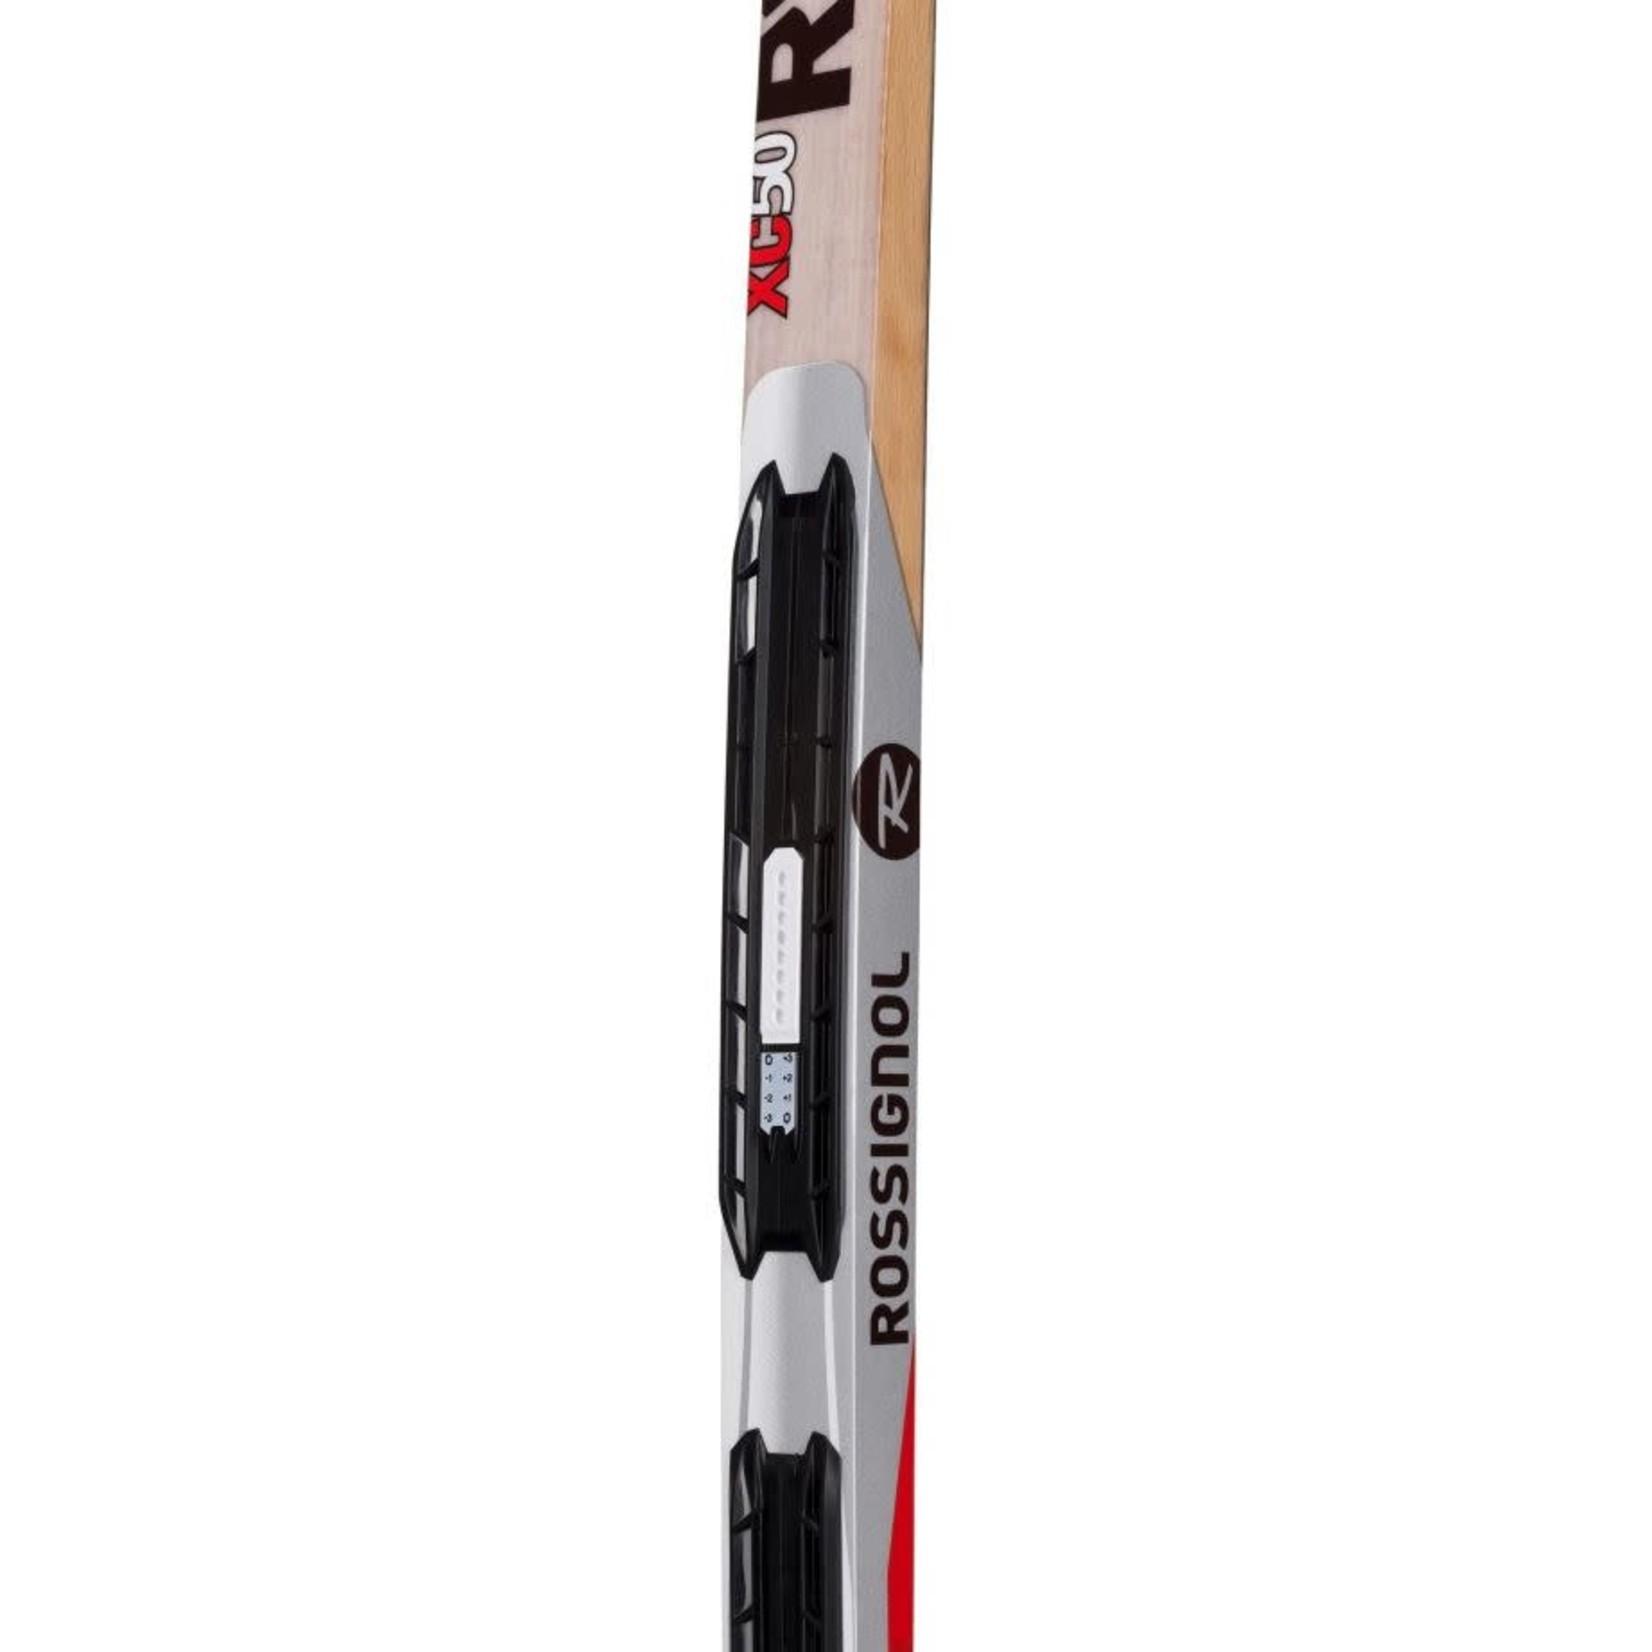 Rossignol Ski de Fond Rossignol R-Skin Evolution